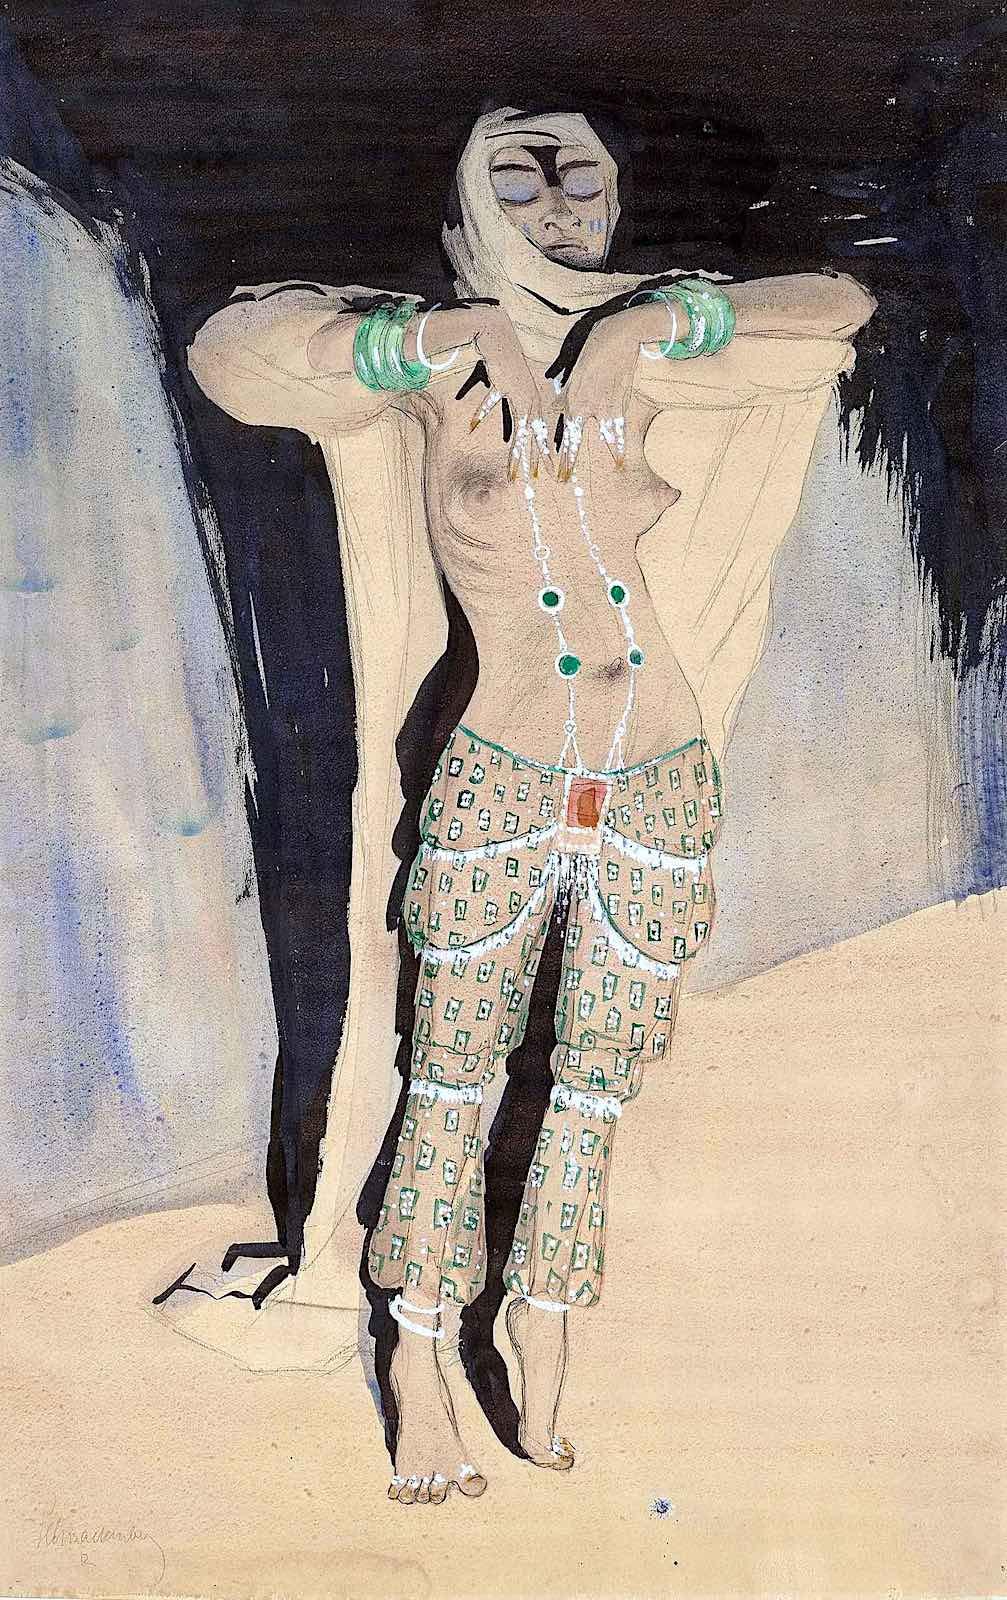 Walter Schnackenberg, an odd dancer